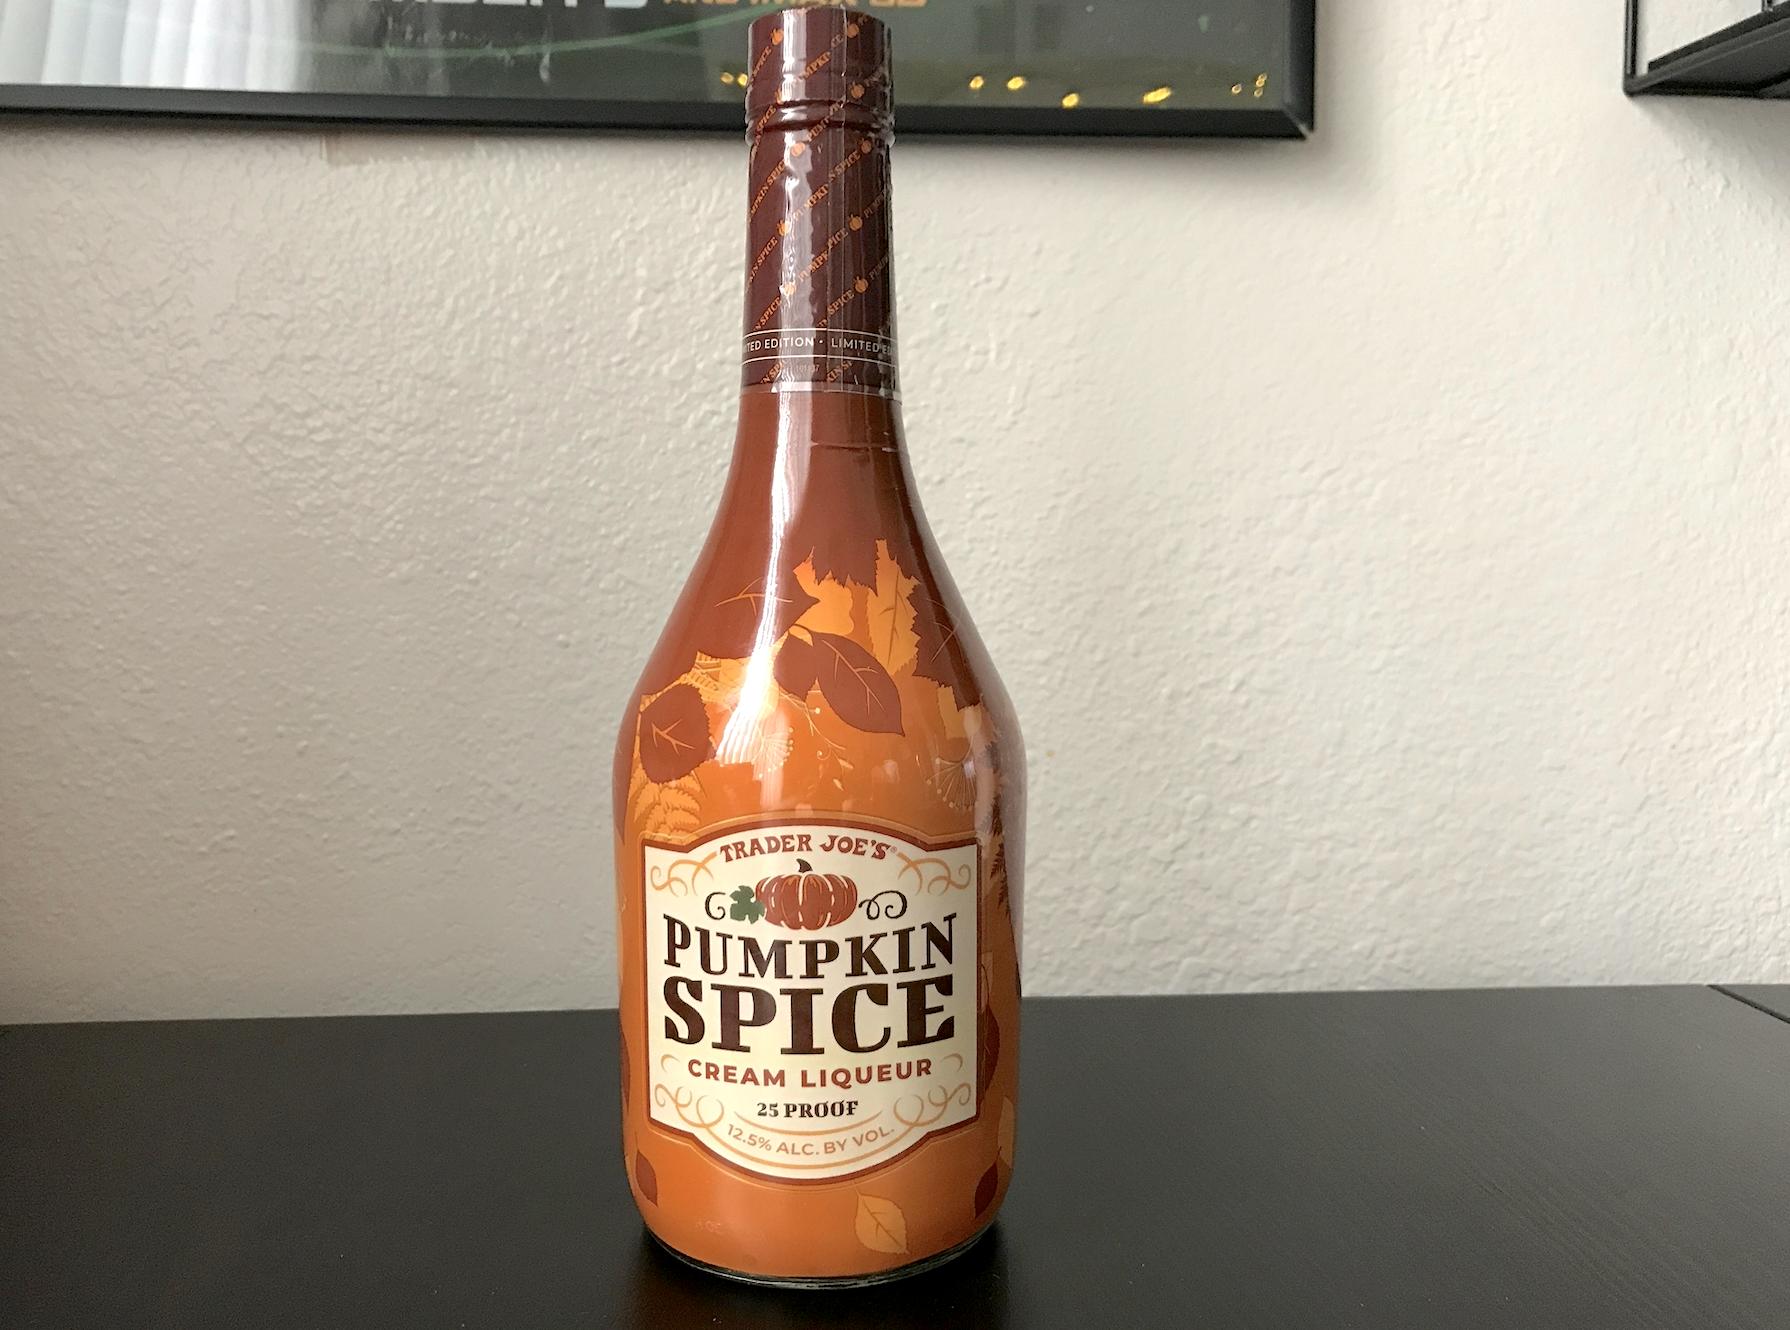 A bottle of pumpkin spice cream liqueur